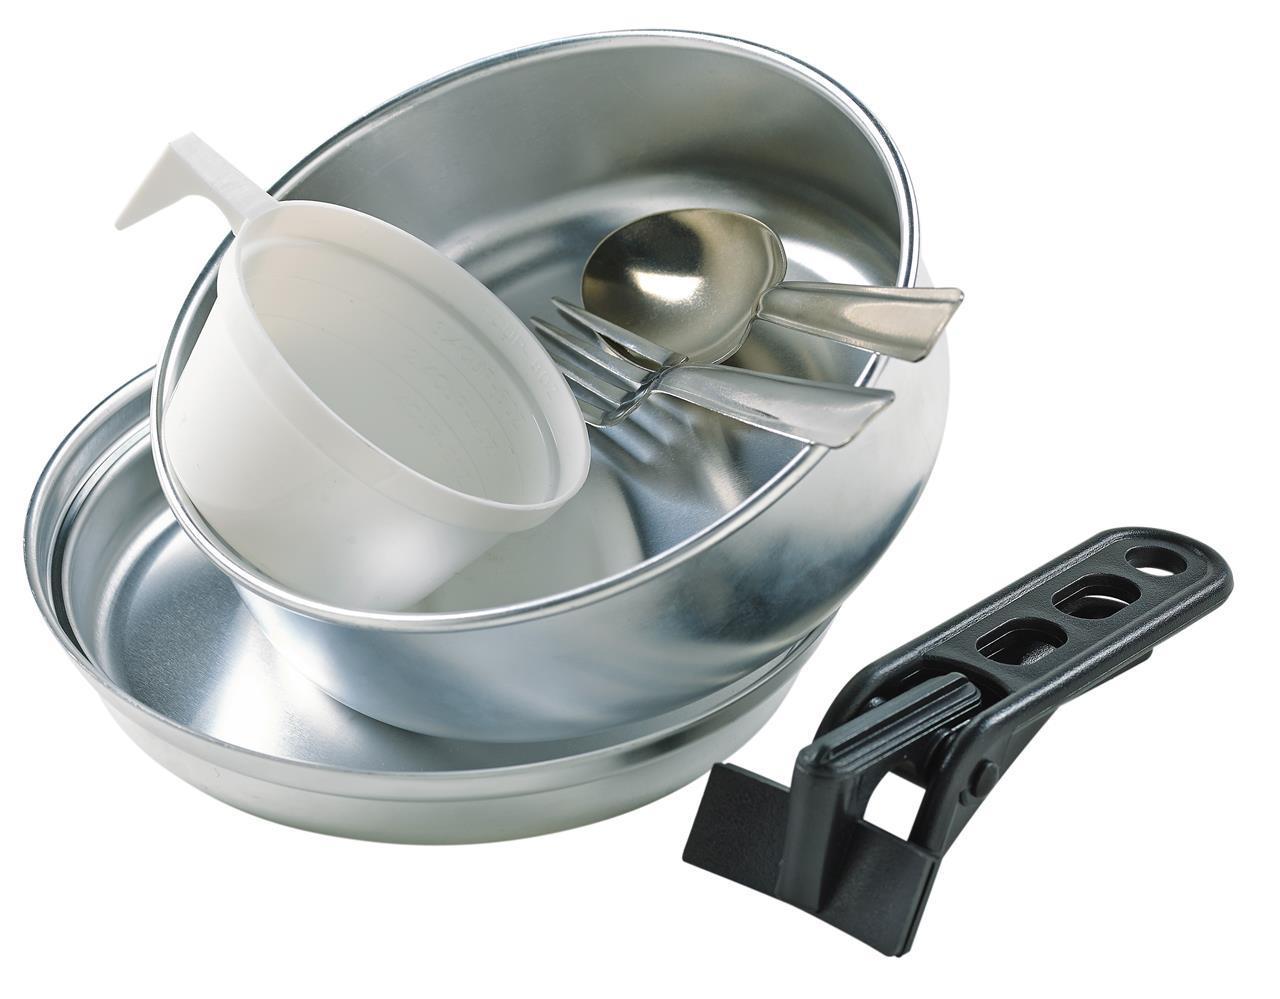 Kokekarsett i aluminium. 6 deler